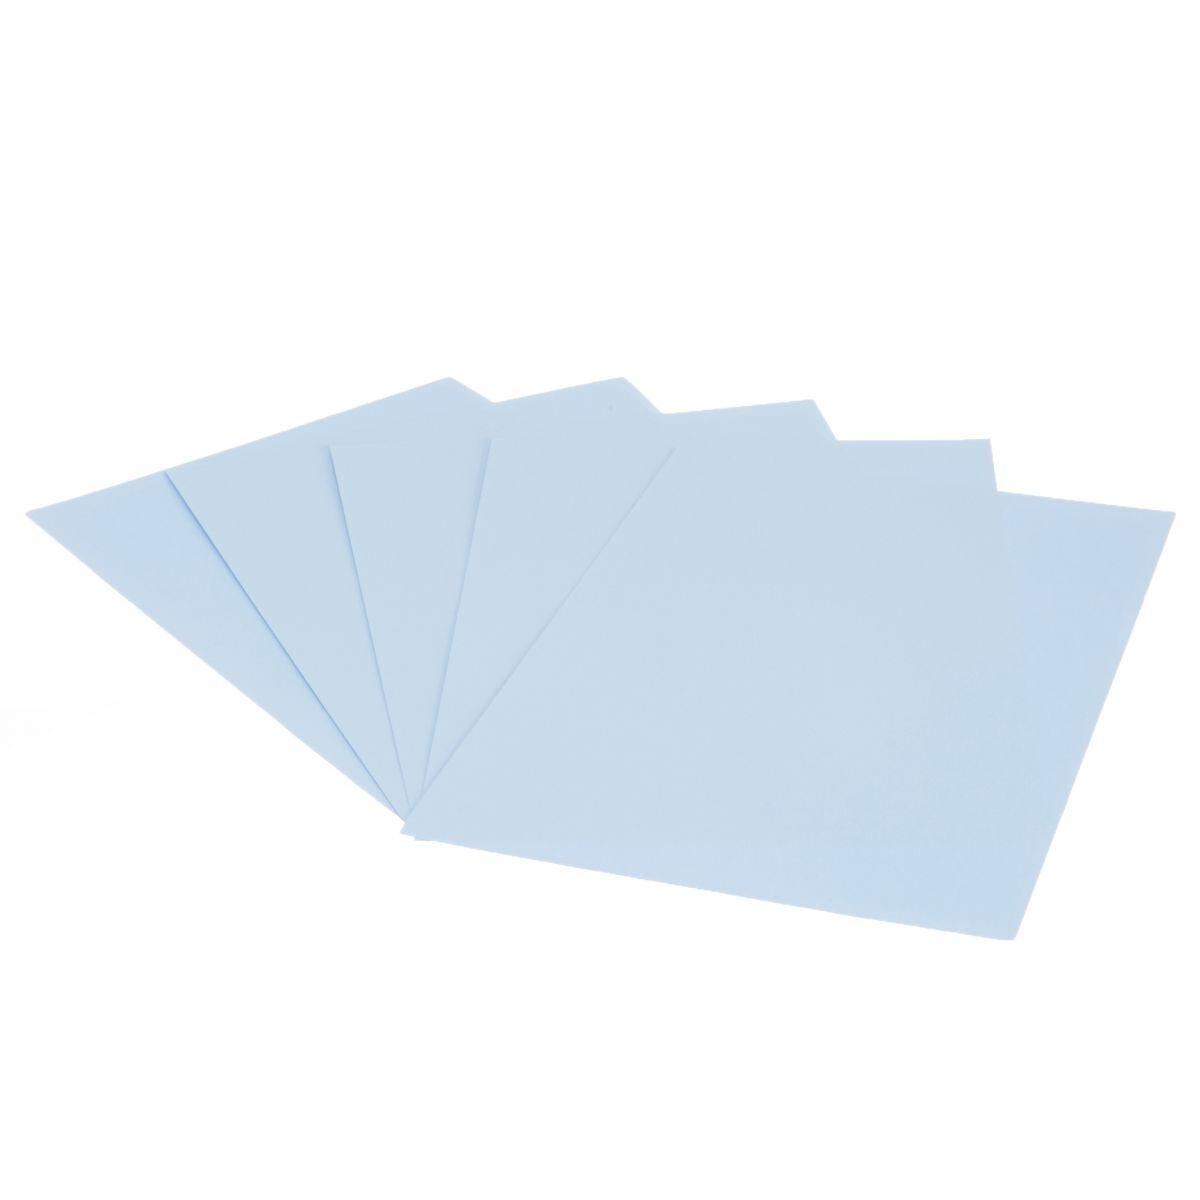 Pollen Paper A4 120gsm Pack of 5 Lavender Blue